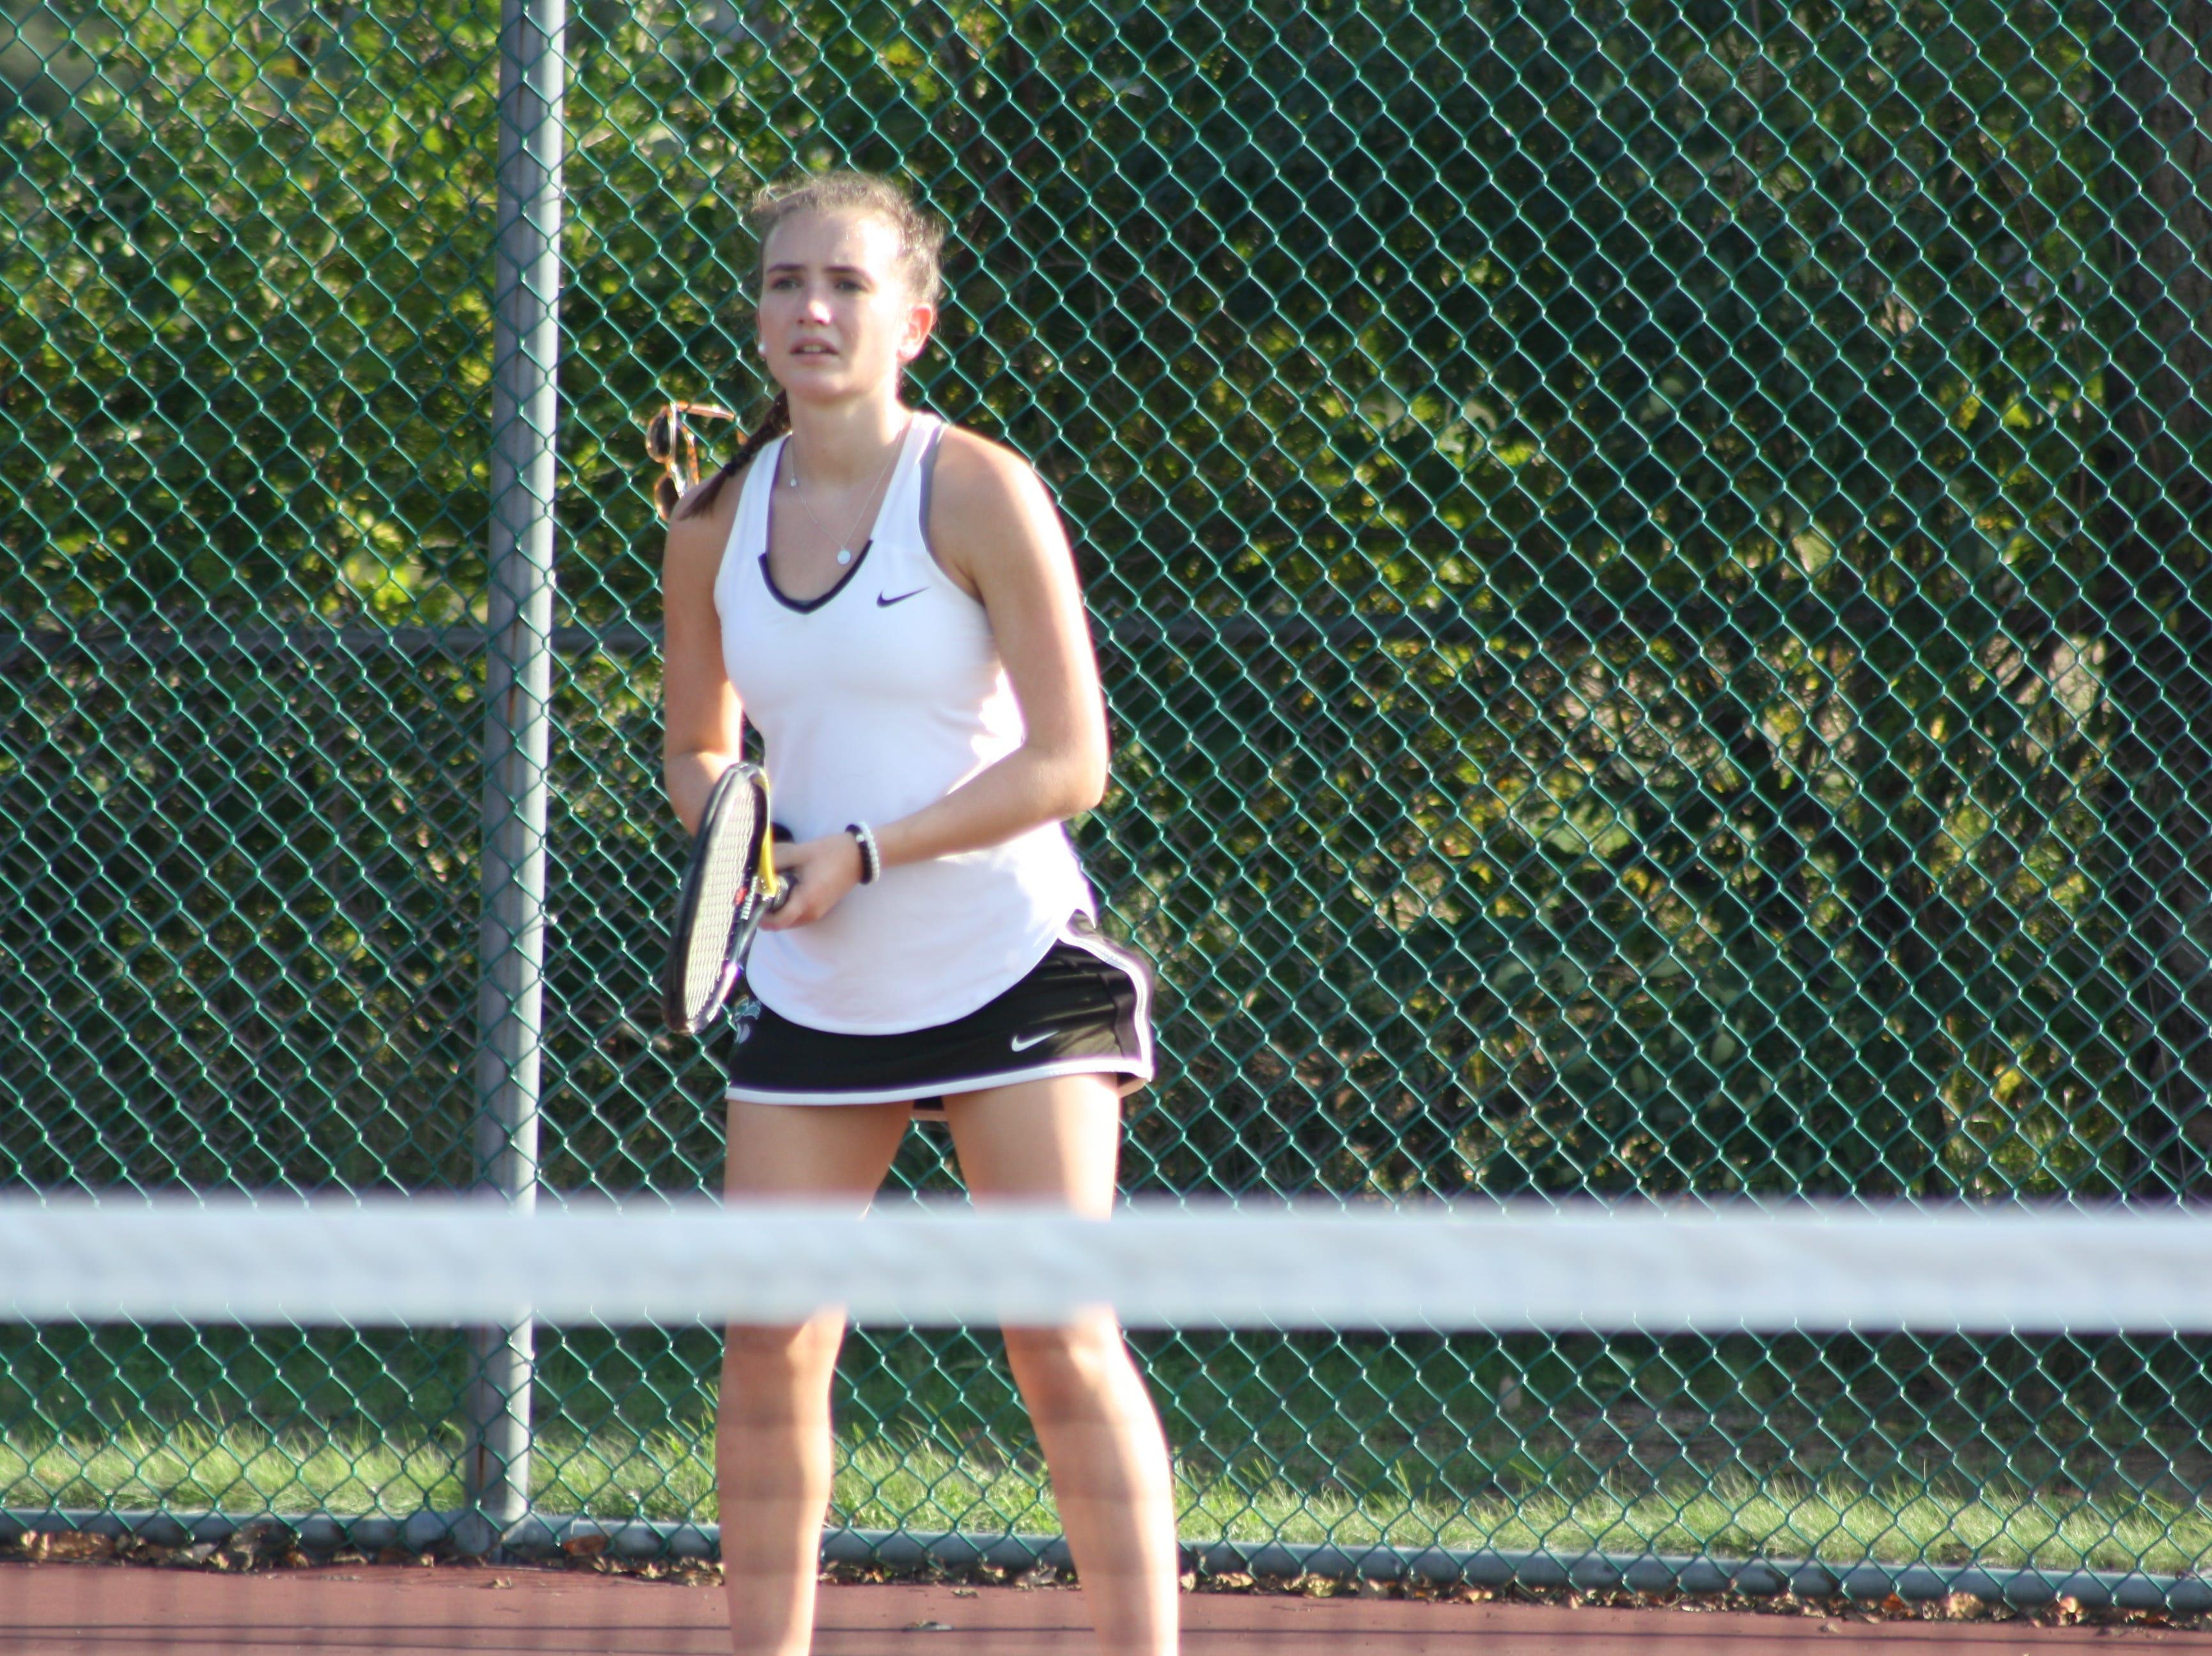 Seton Catholic High School junior Julianna Miller, 16, competes in a tennis match against Windsor's varsity girl's tennis team on Sept. 18.